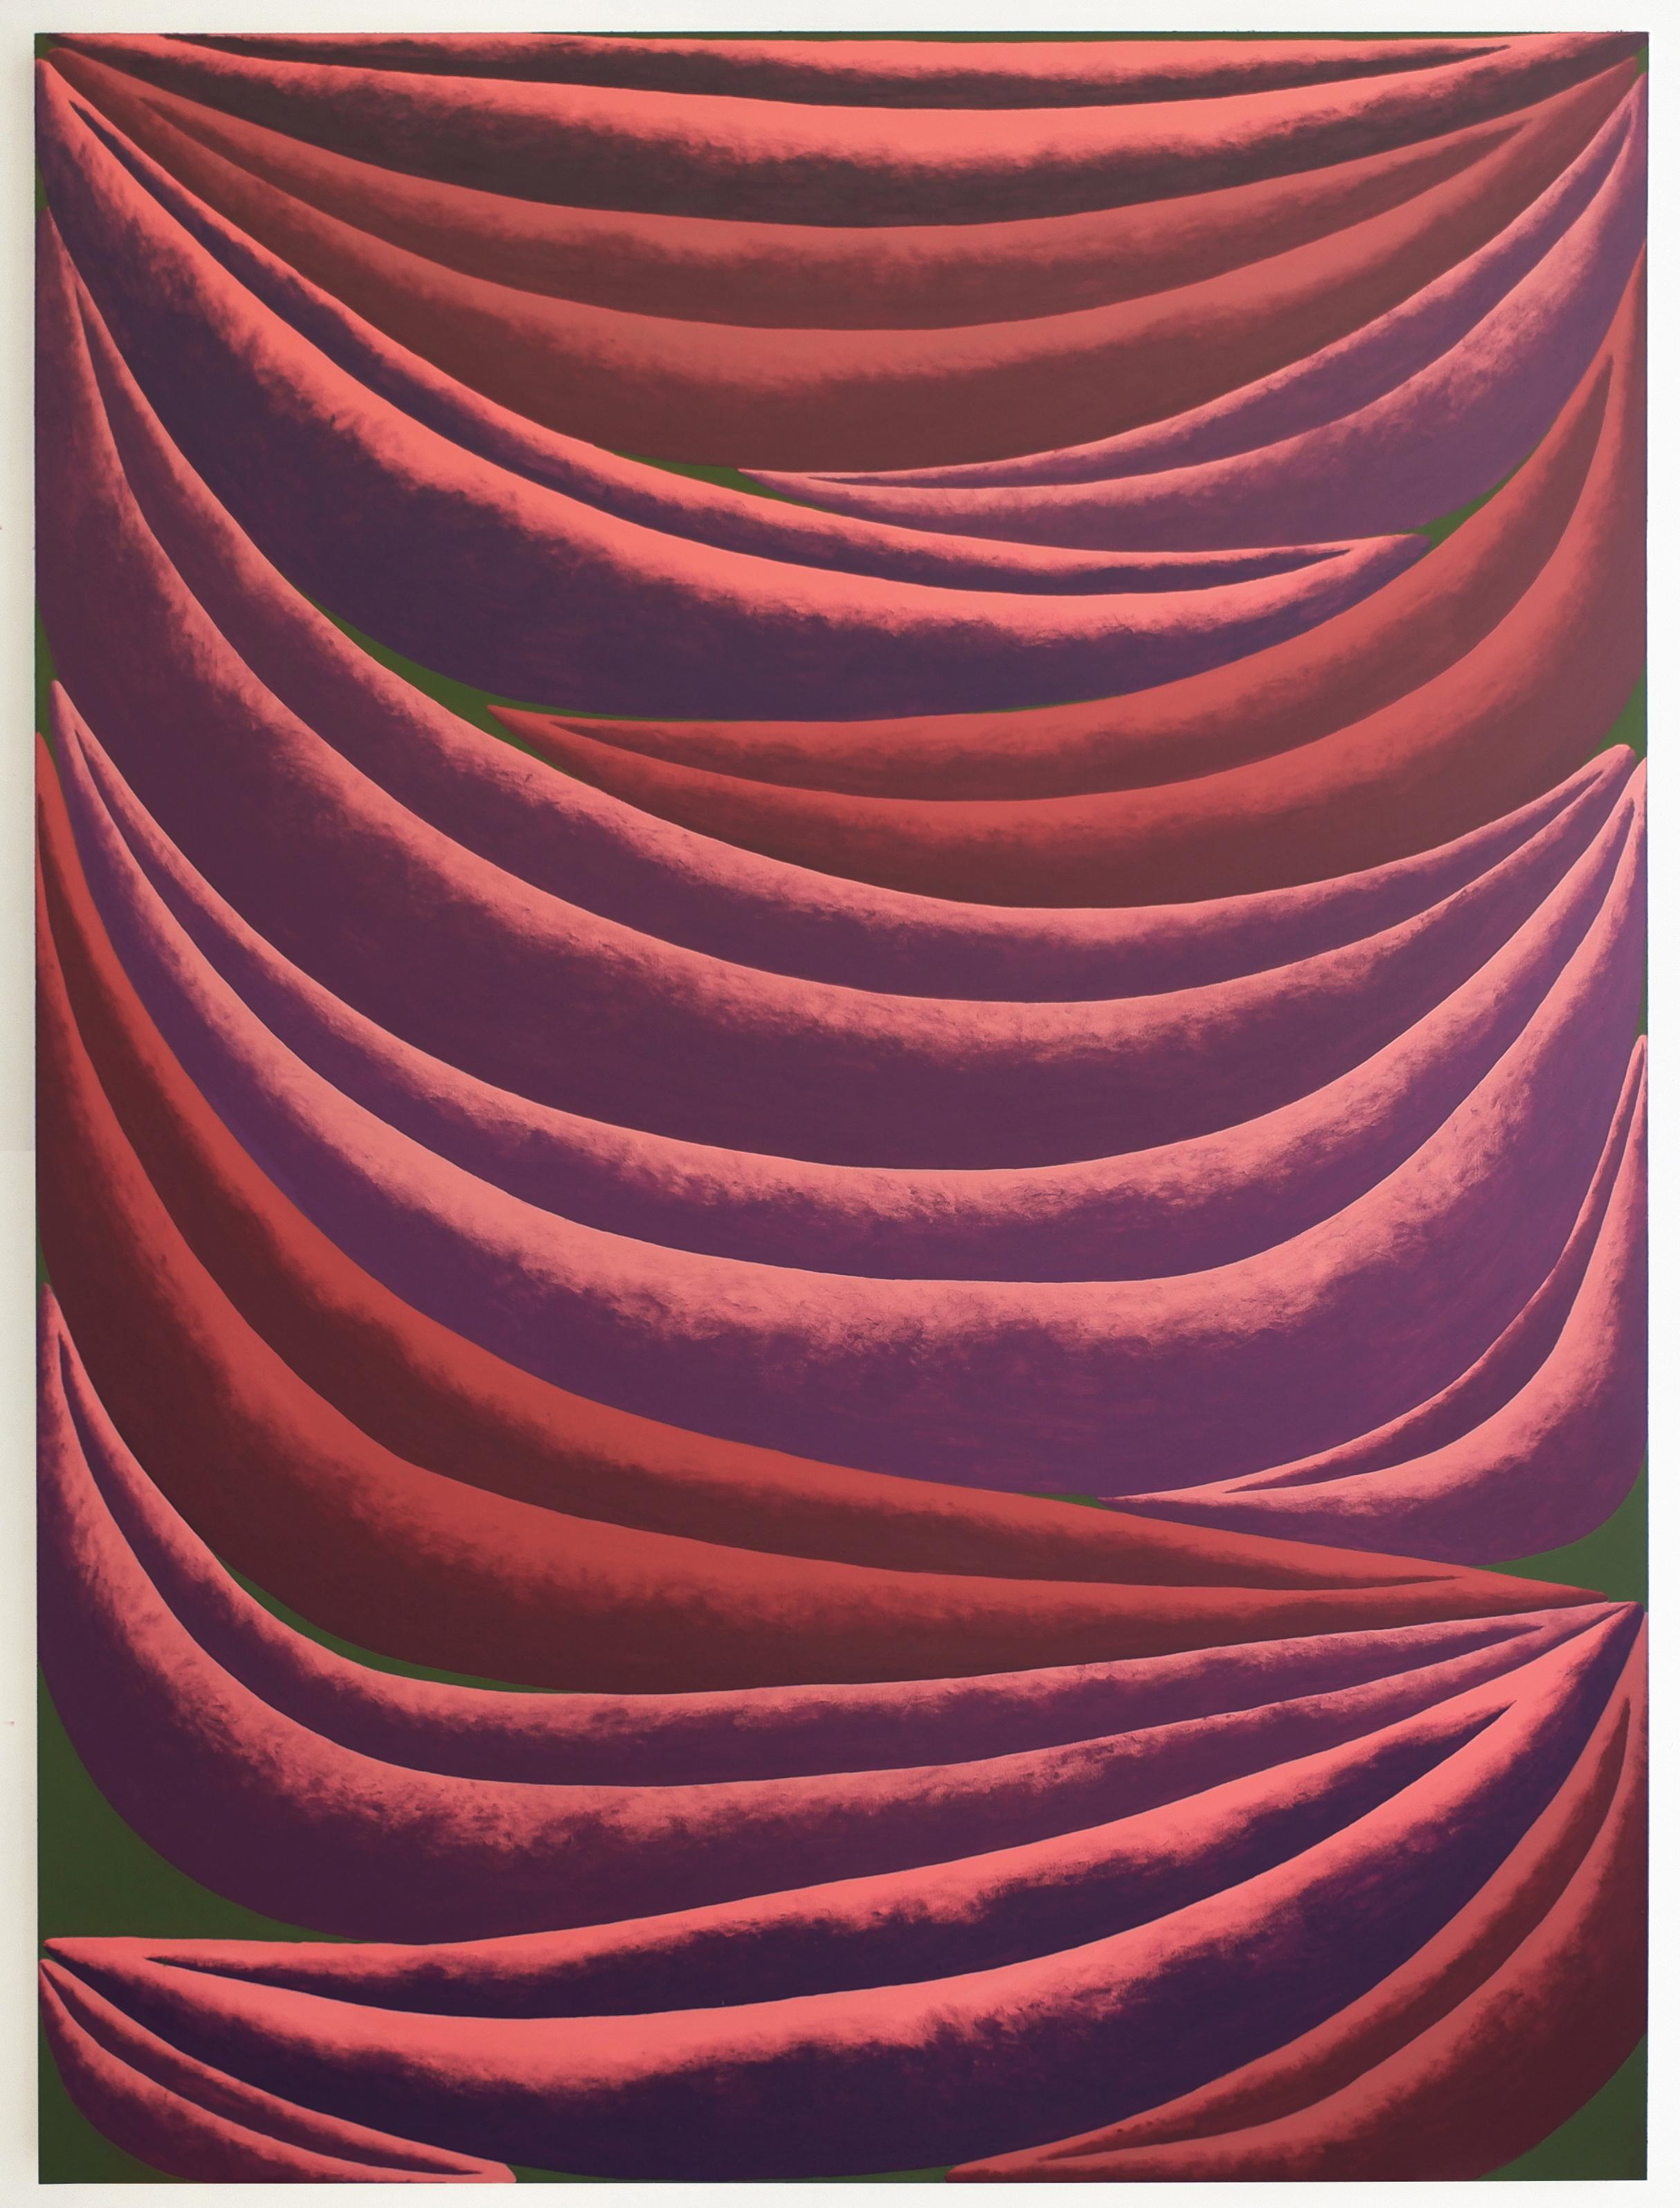 Corydon Cowansage, Pink, Purple, Green, 2021, acrylic on canvas, 78 x 58 inches